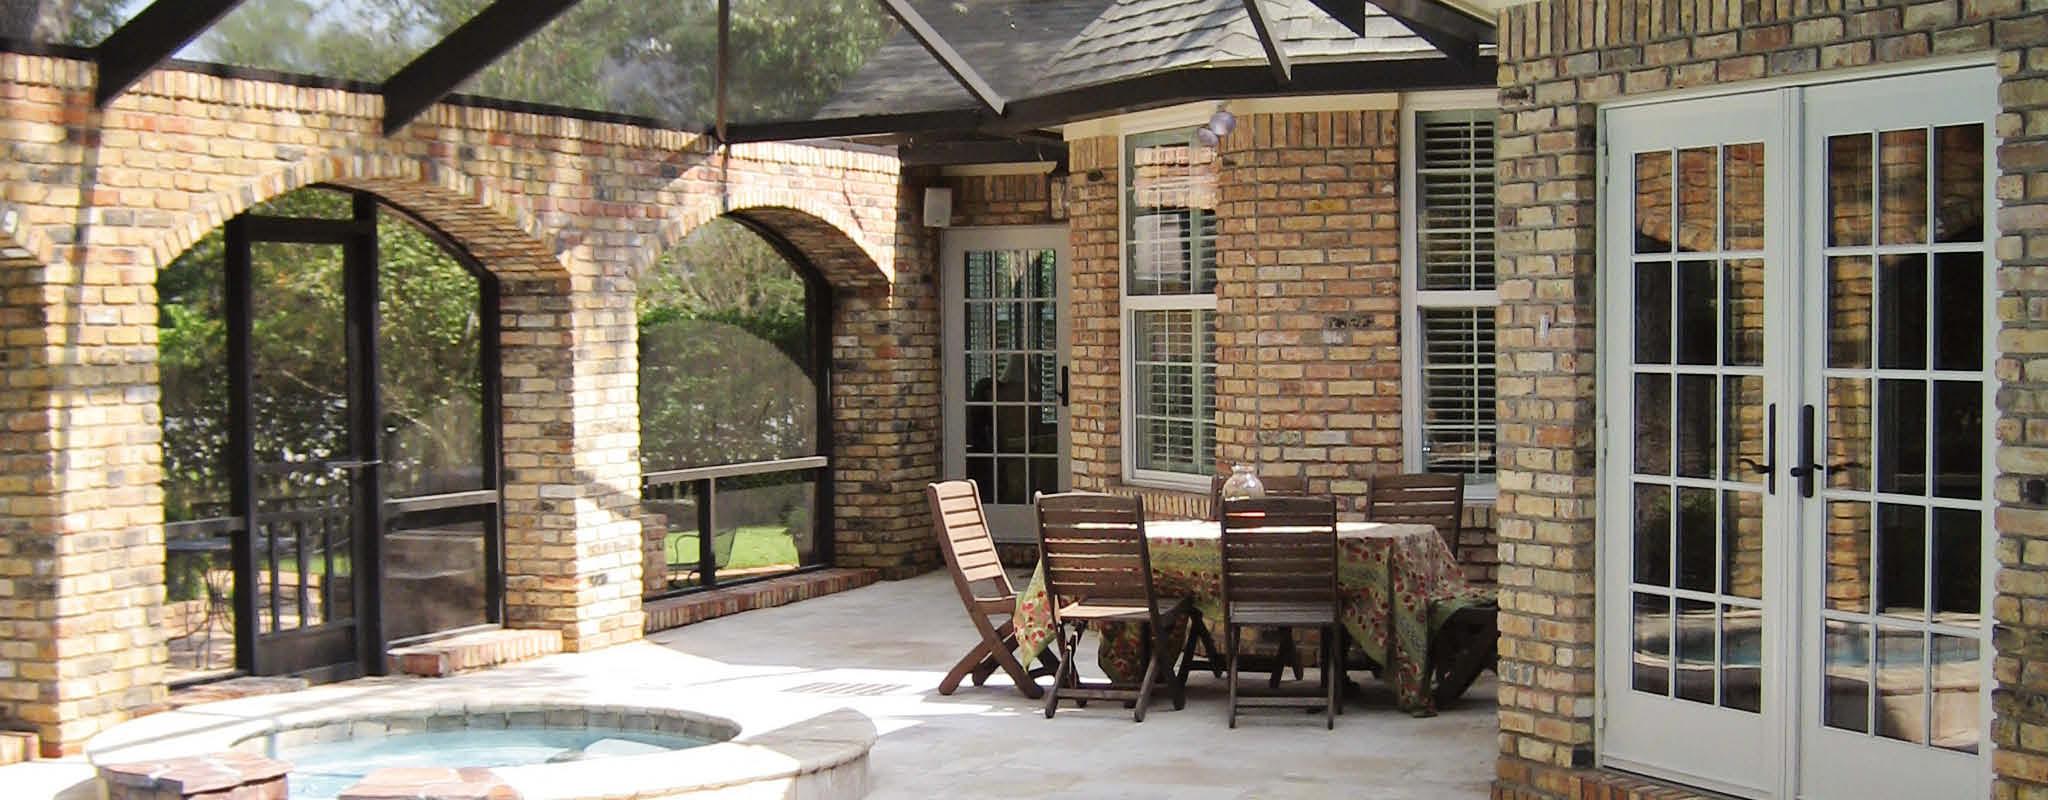 Pool Enclosure/Addition